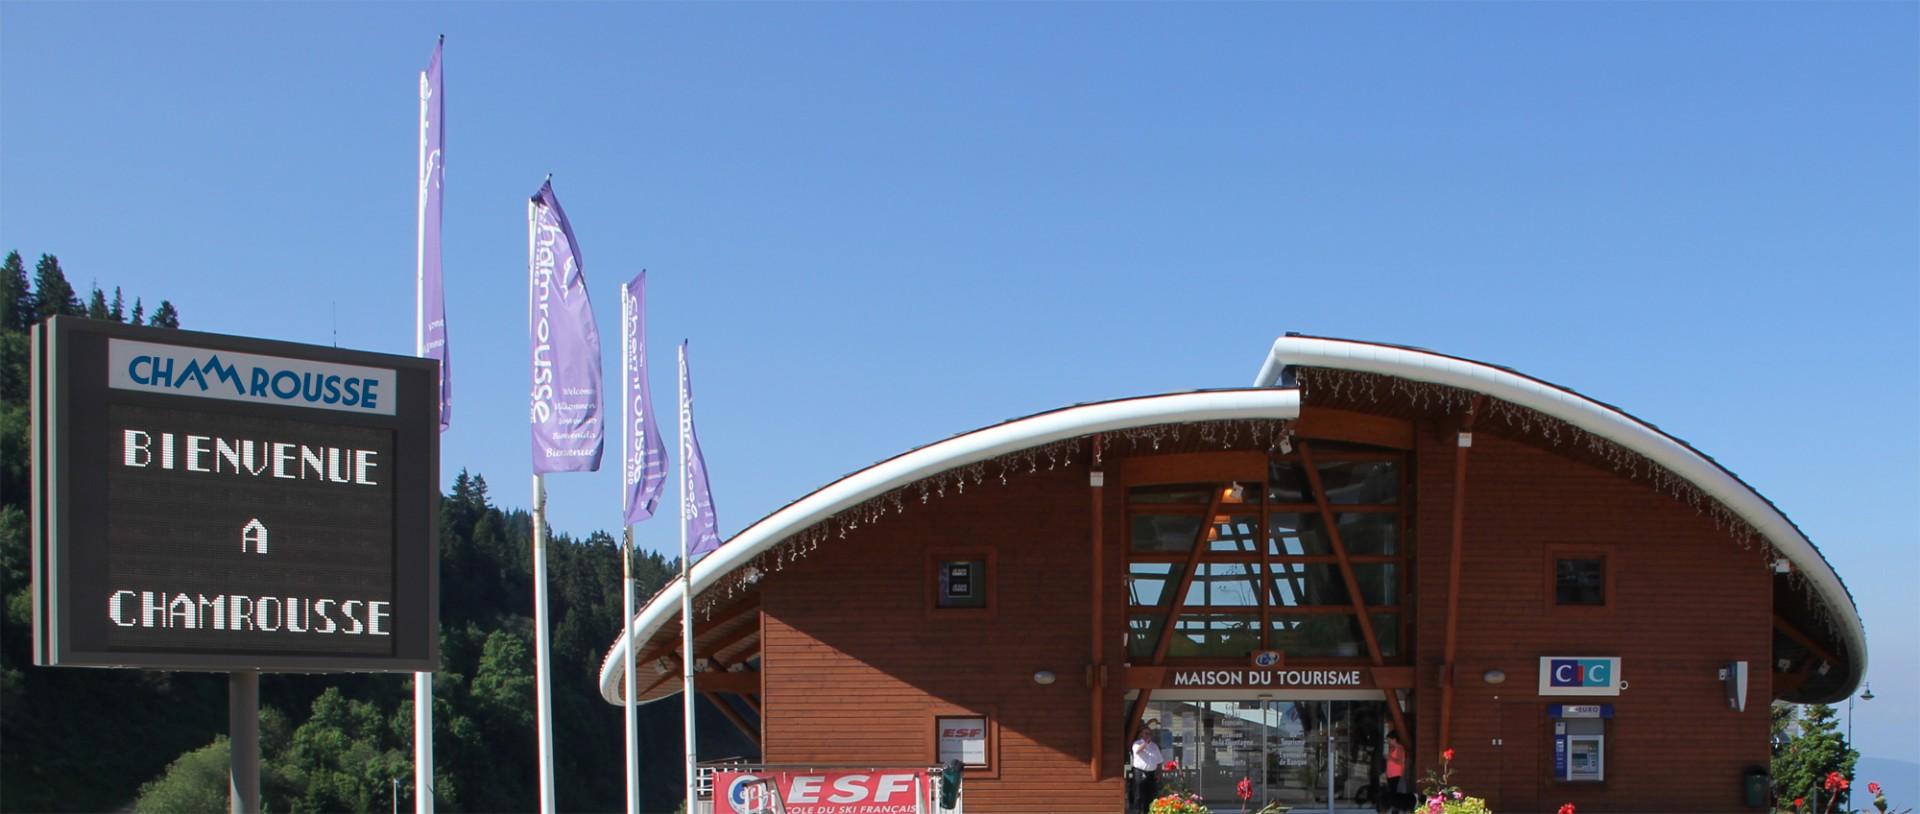 Tourist Office of Chamrousse